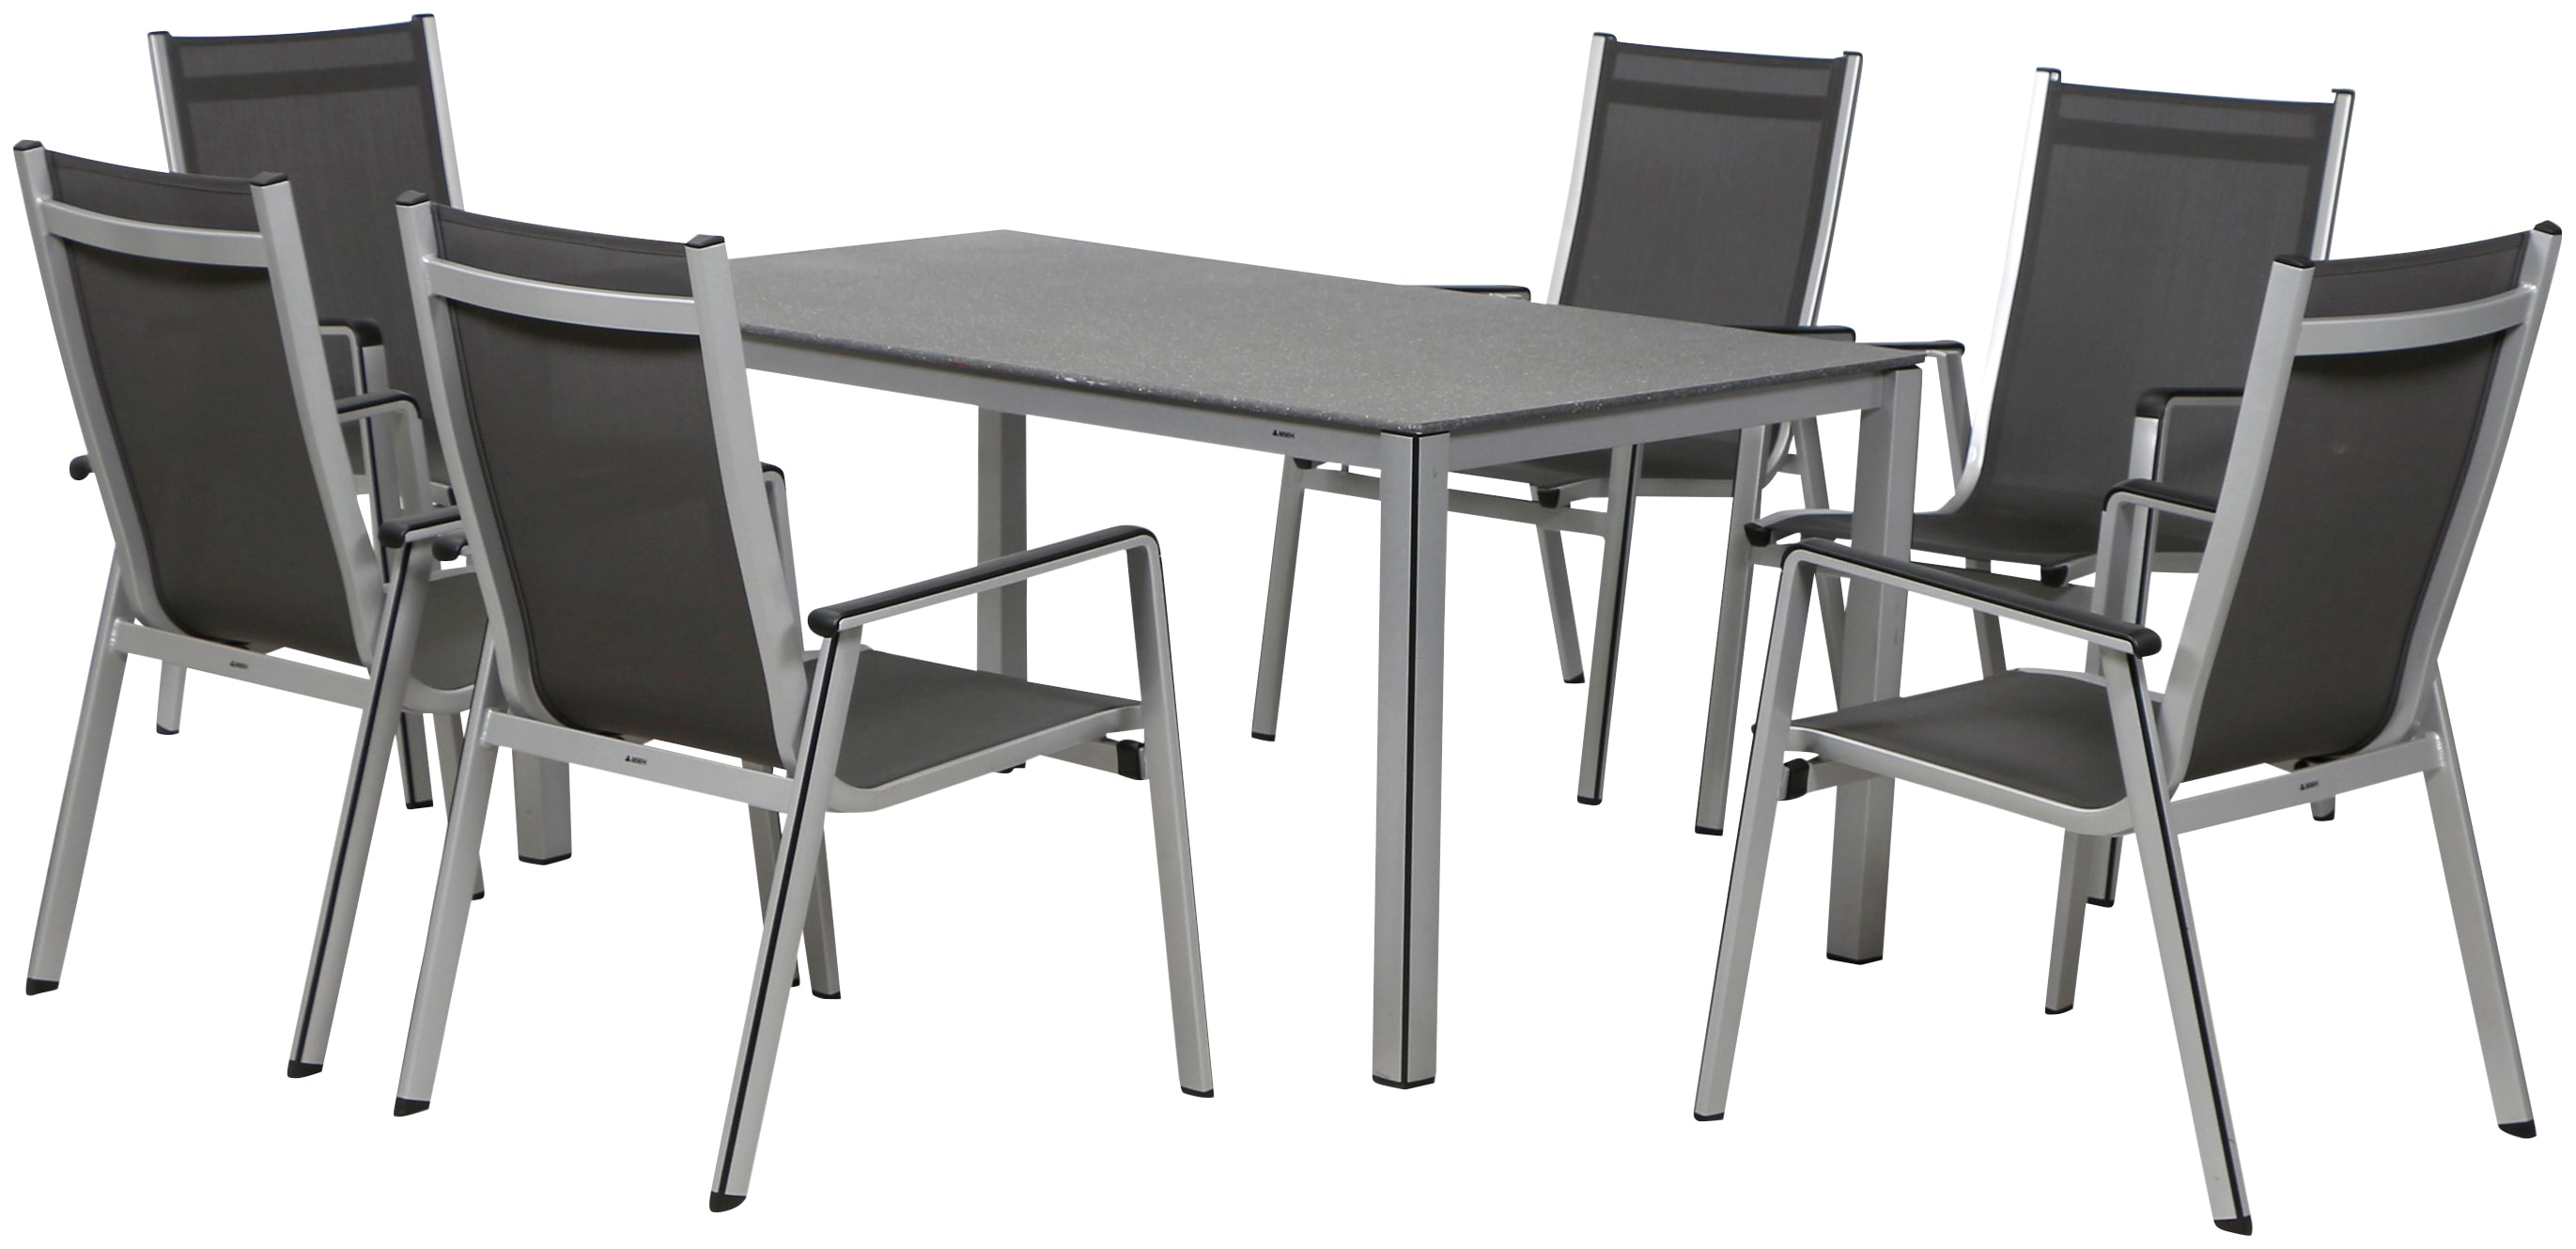 MWH Gartenmöbelset Elements 7tlg 6 Sessel Tisch 160x90 cm Aluminium